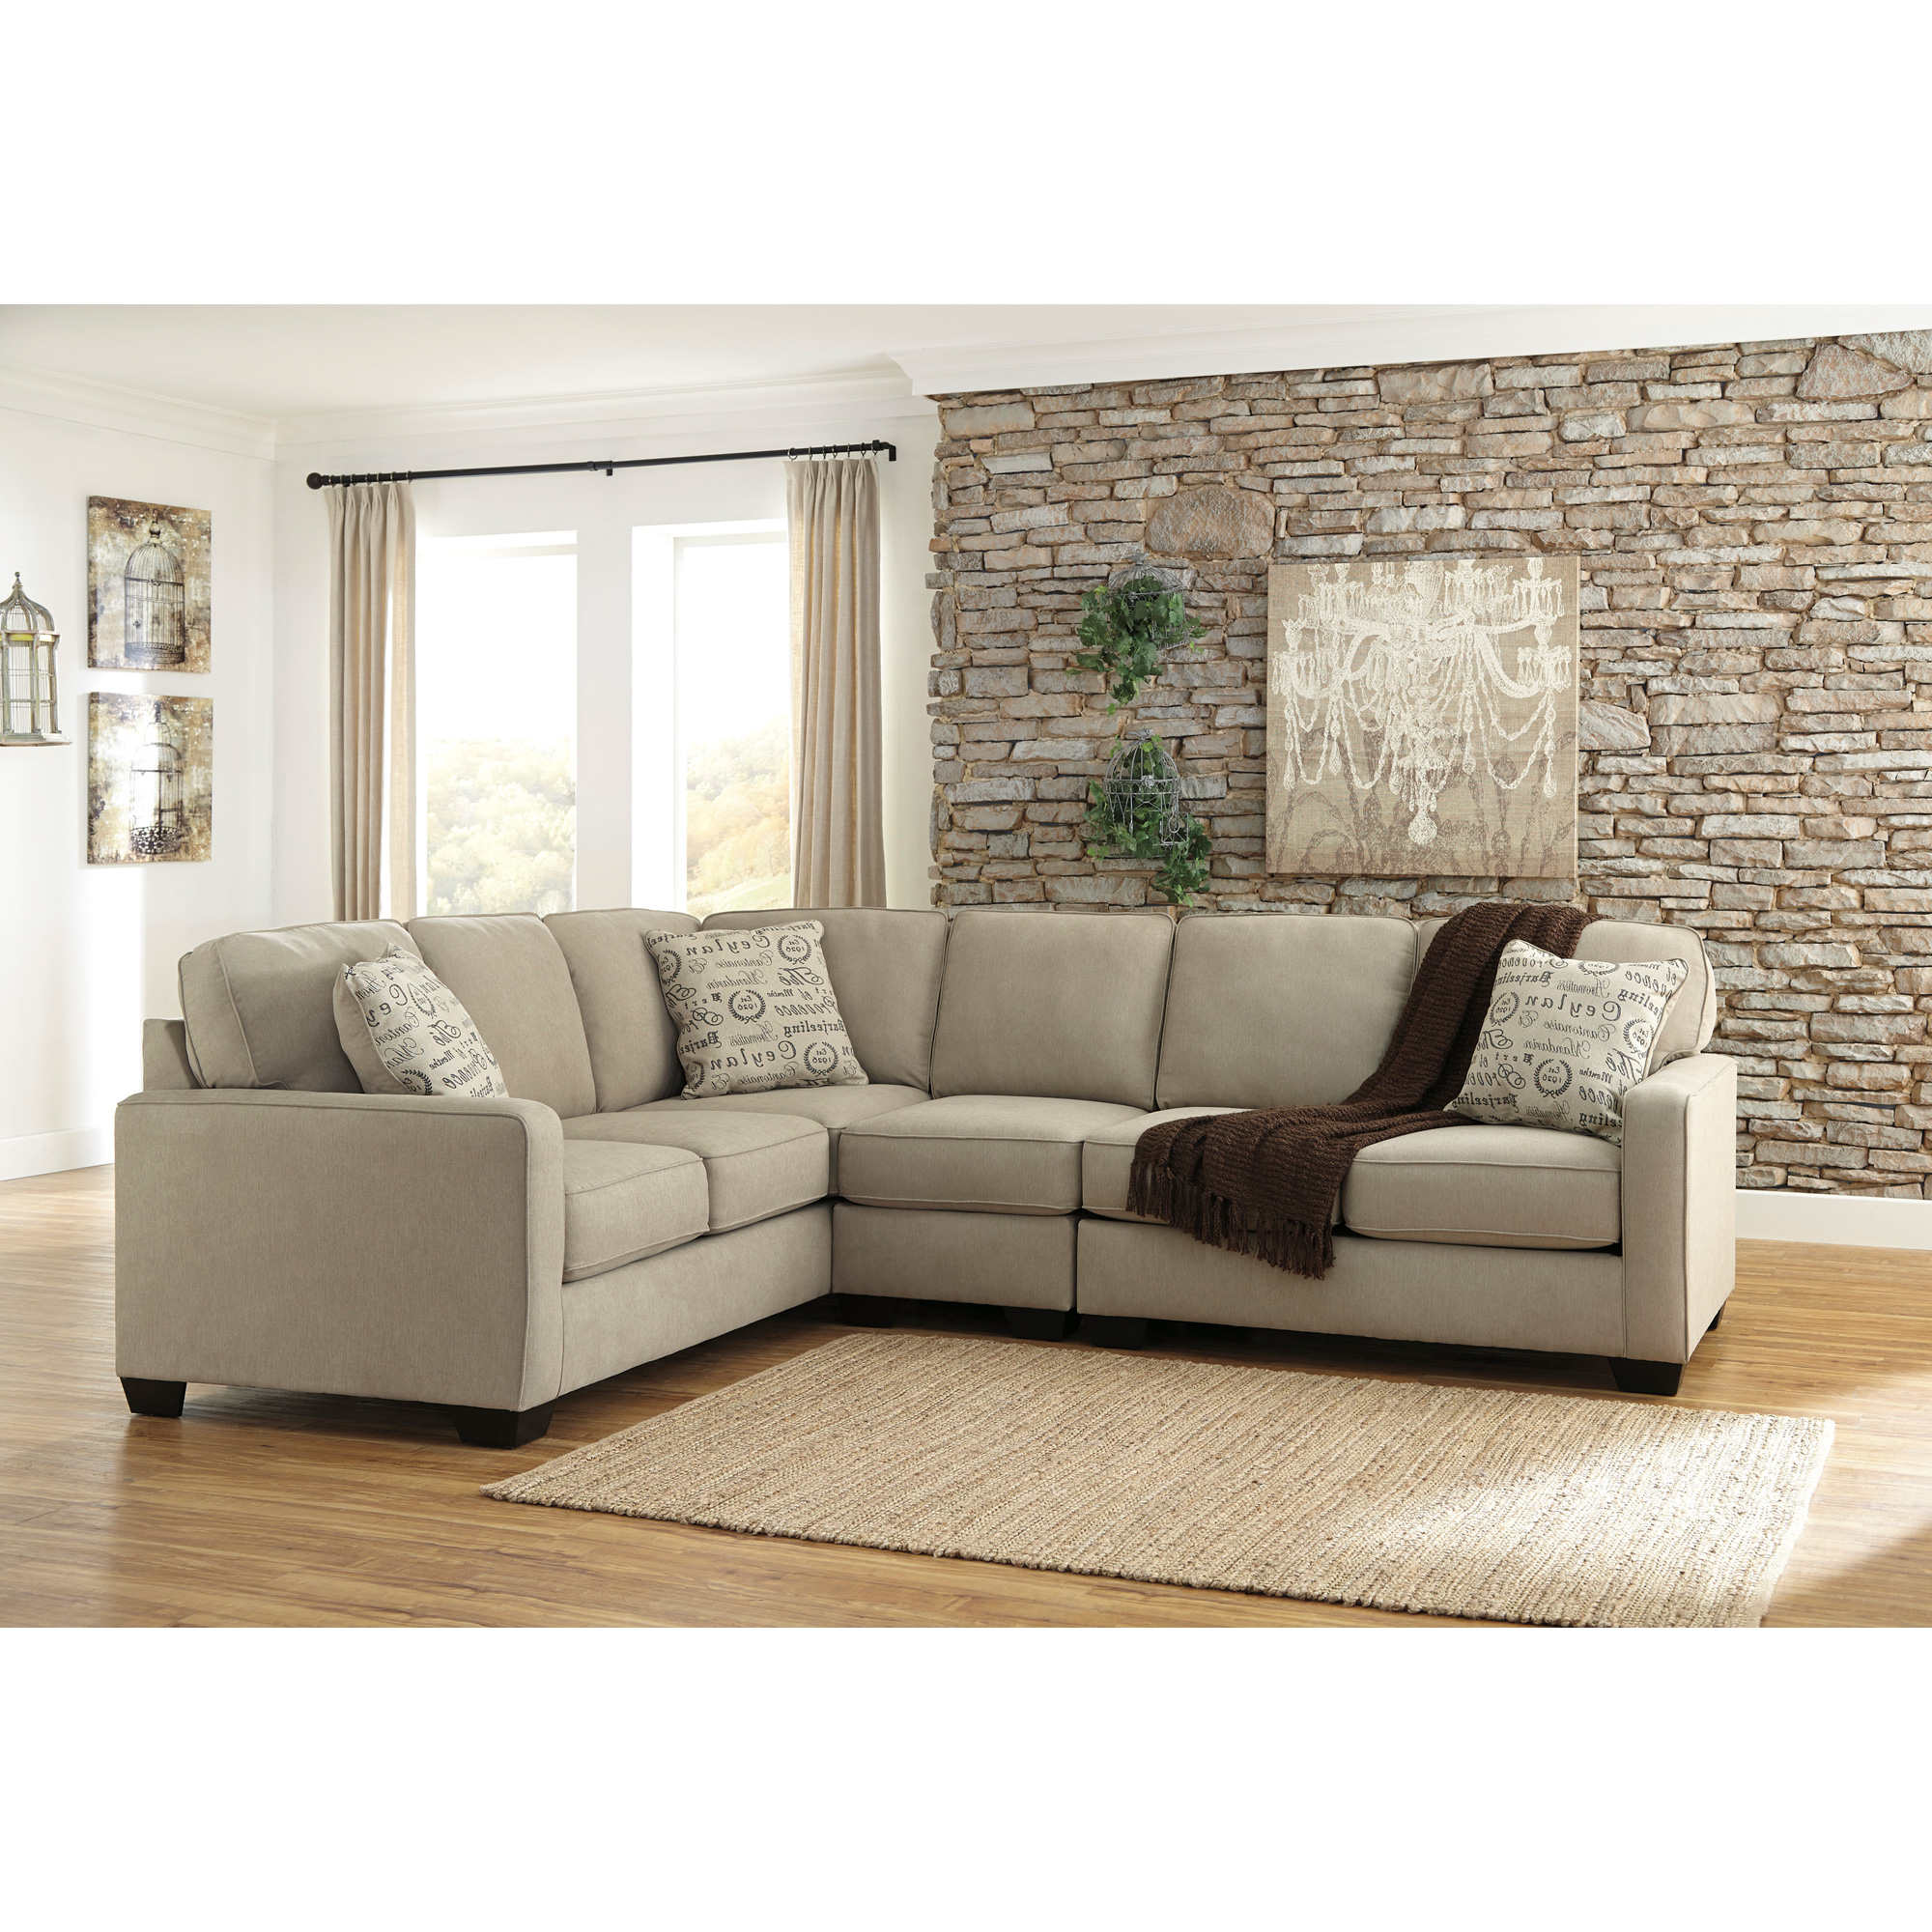 Ashley Furniture | Alenya Quartz 3 Piece Right Sectional Sofa